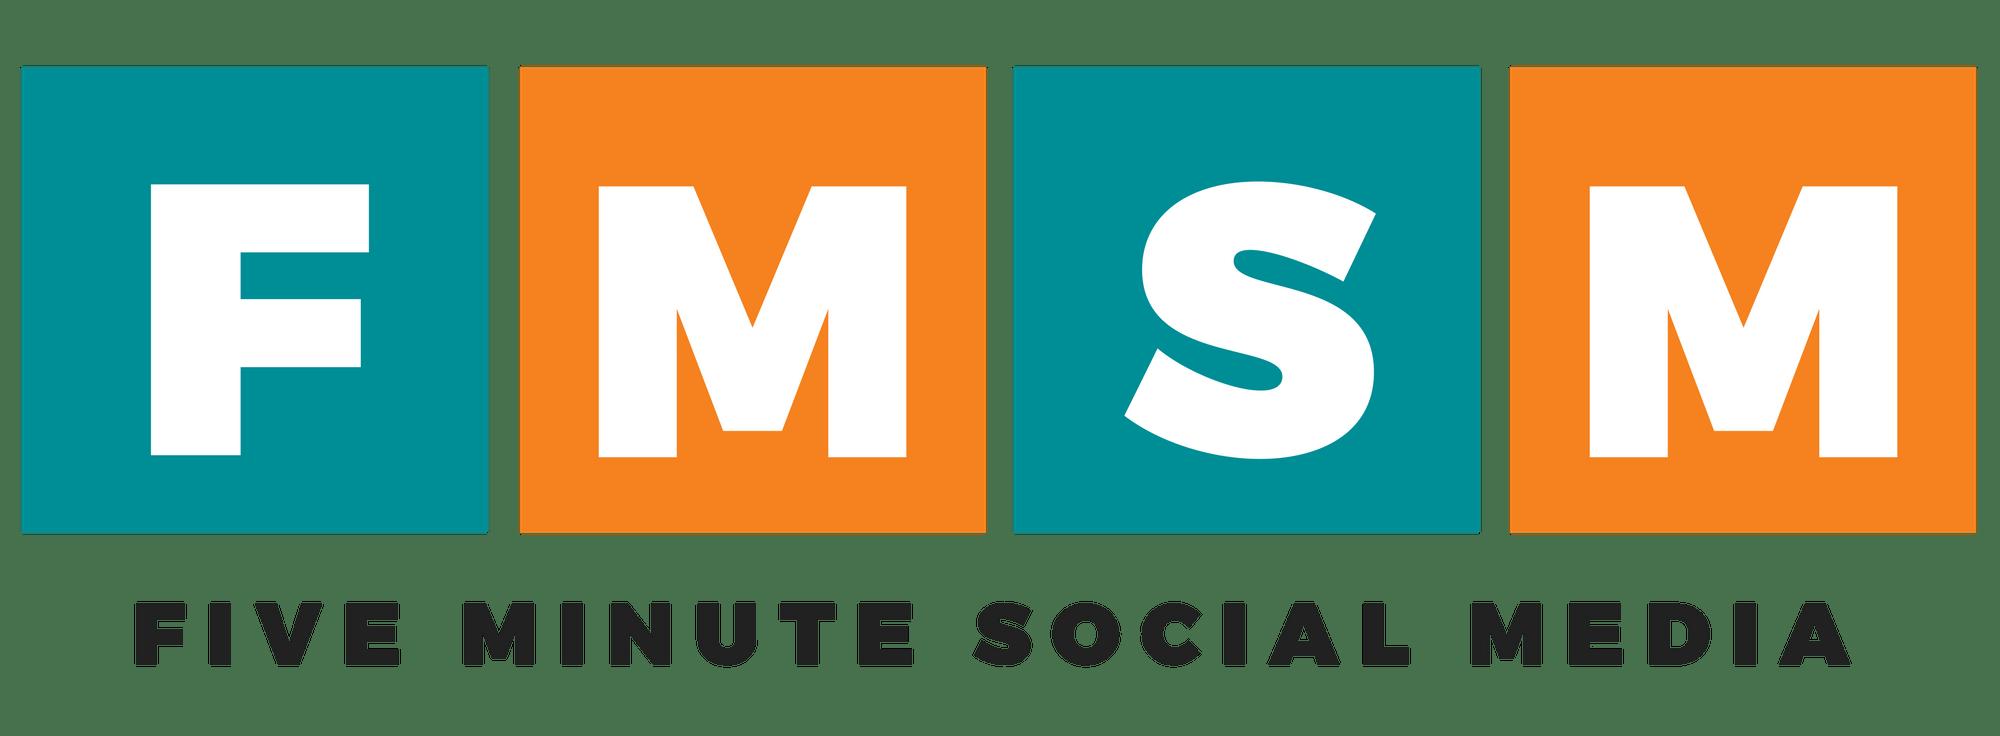 Five Minute Social Media Logo - Horizontal, Black